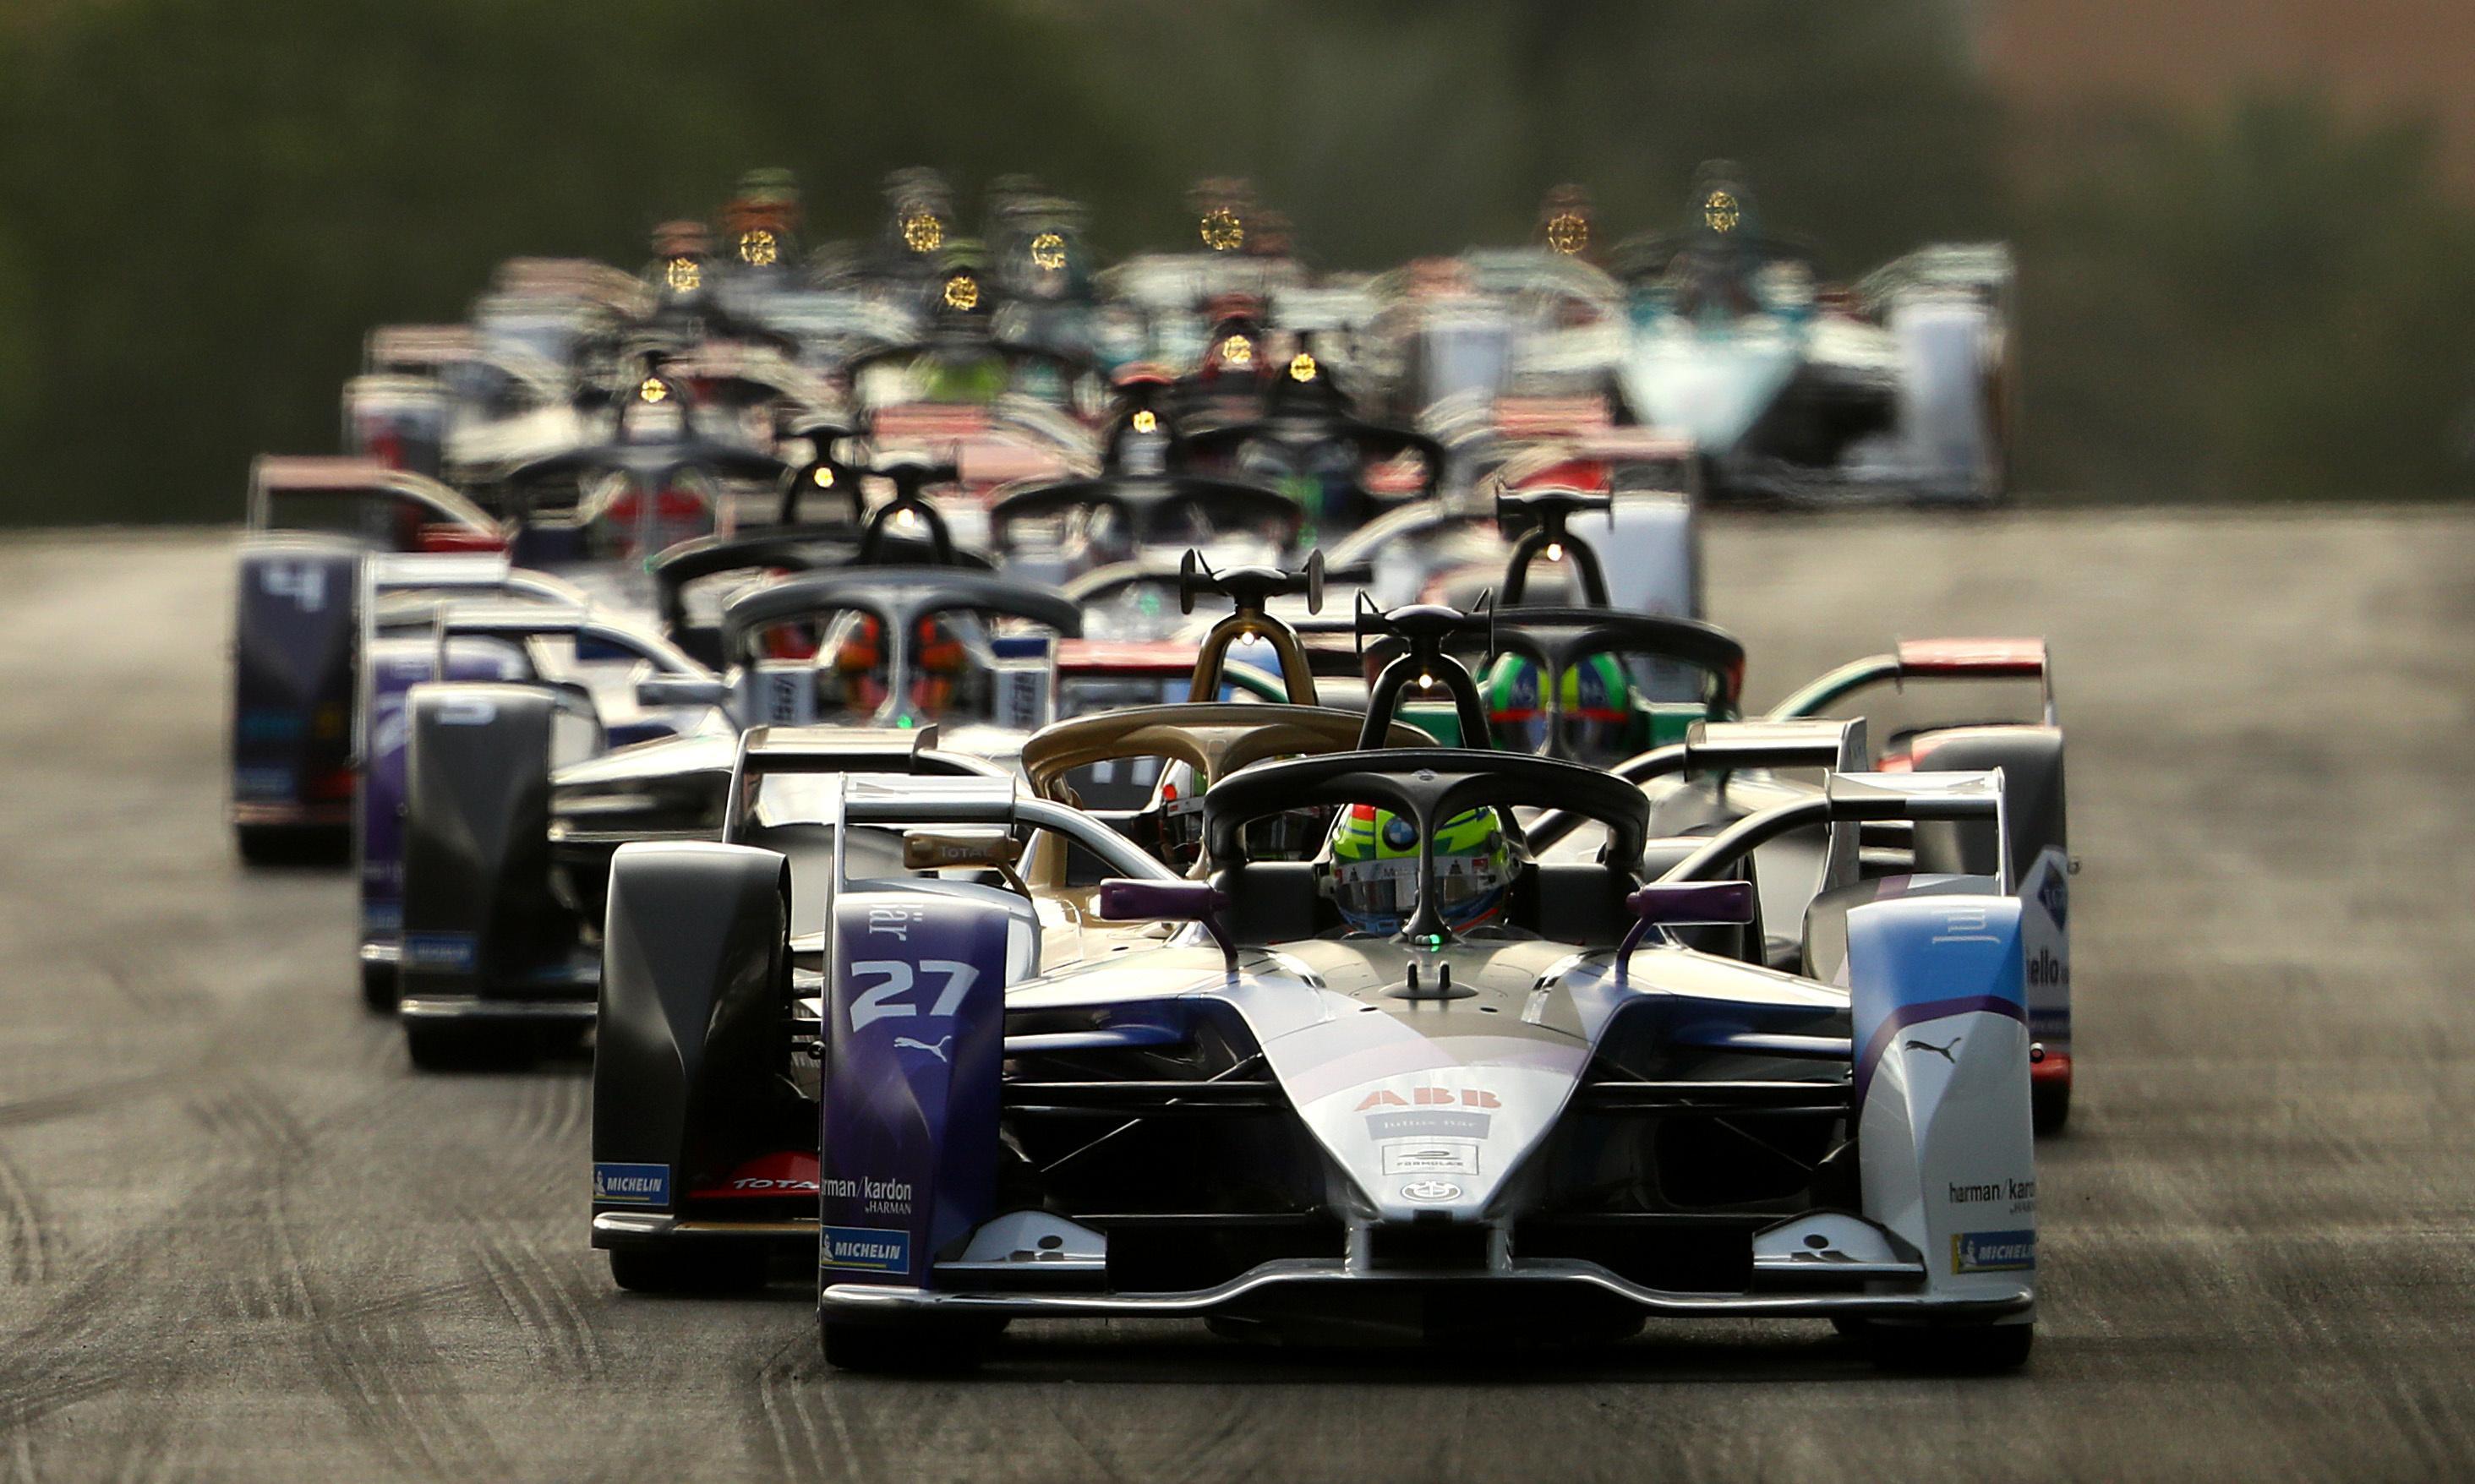 F1 risks sportswashing boost with Saudi Arabia GP, says human rights group